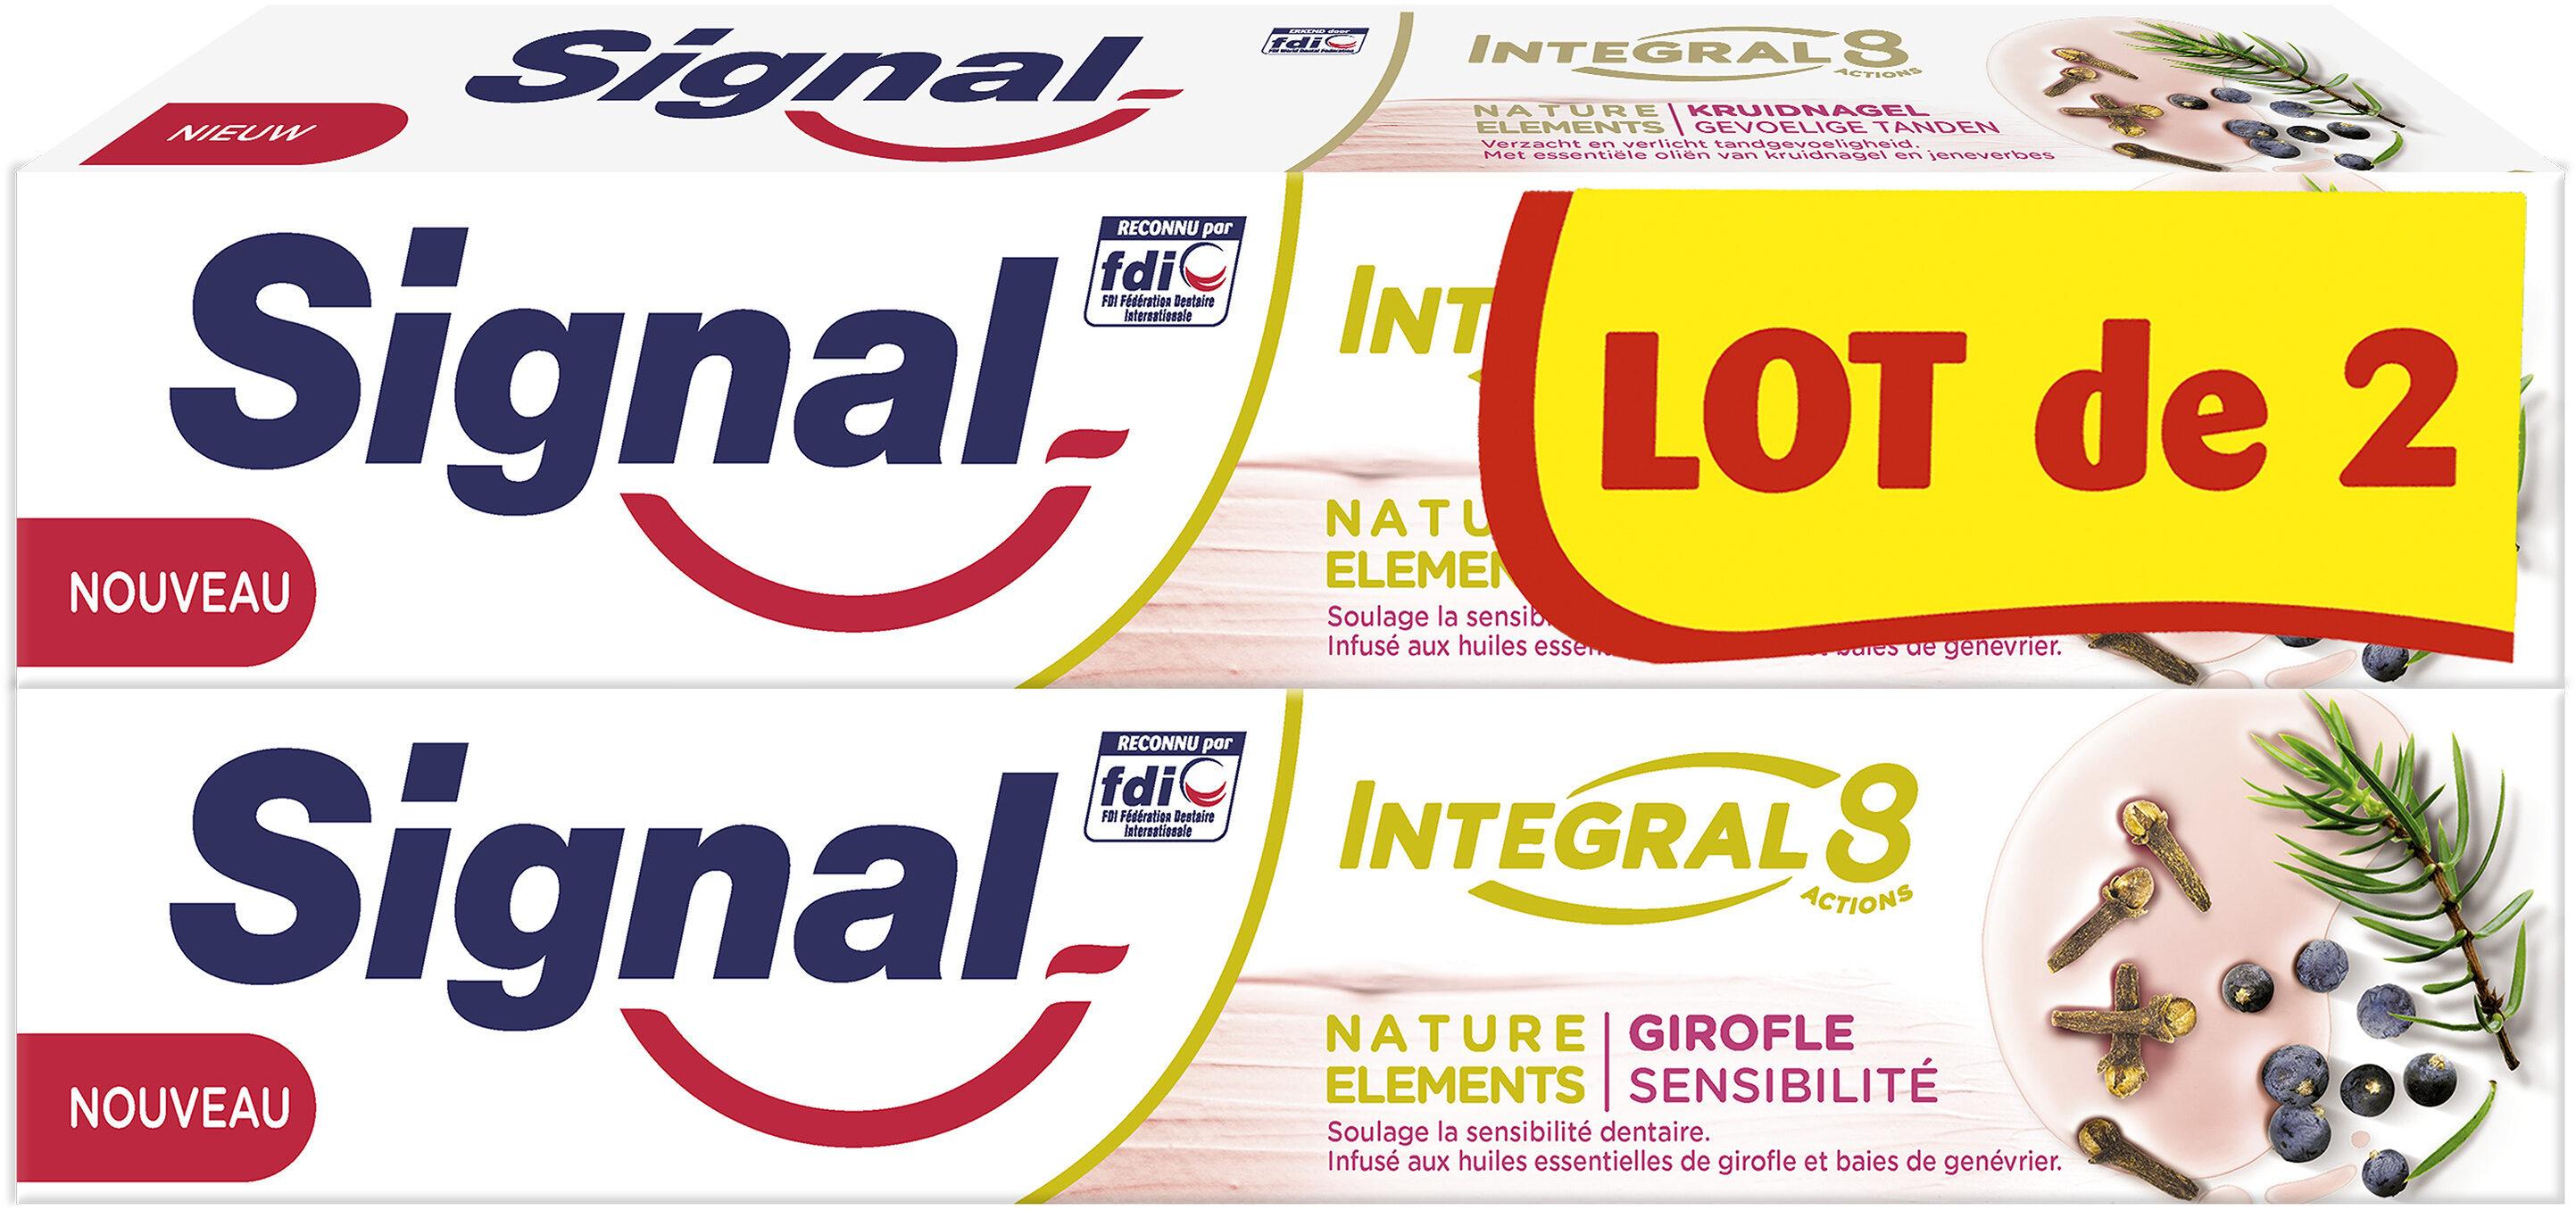 Signal Integral 8 Dentifrice Nature Elements Girofle Sensibilité 2x75ml - Produit - fr